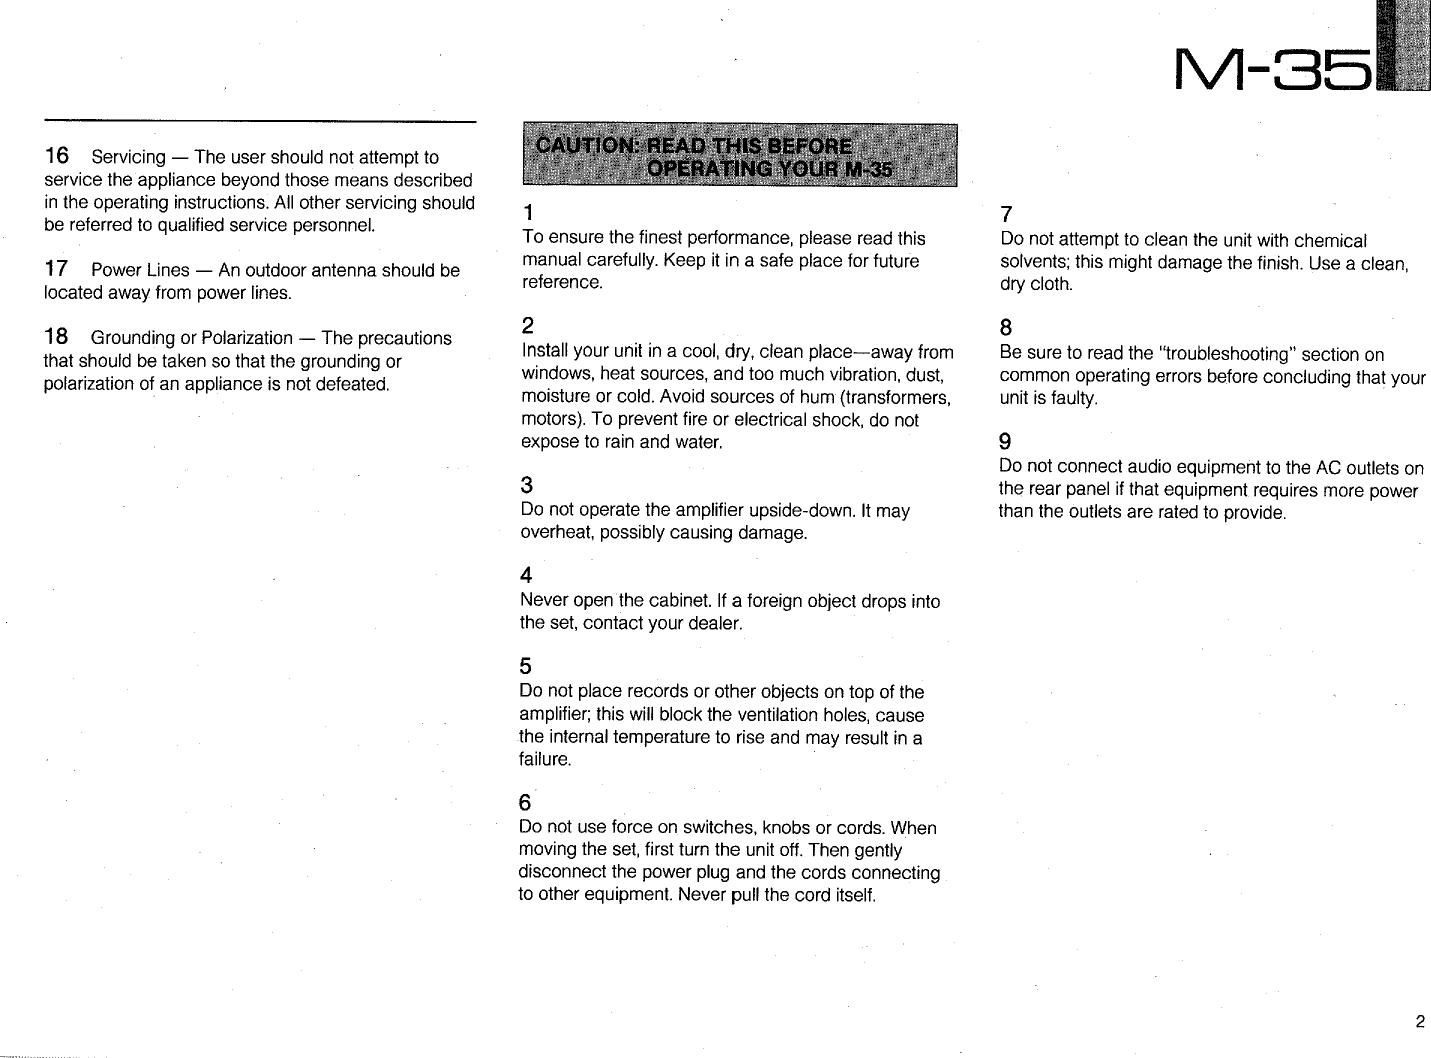 yamaha m 35 owner s manual rh usermanual wiki M35A3 M35A3